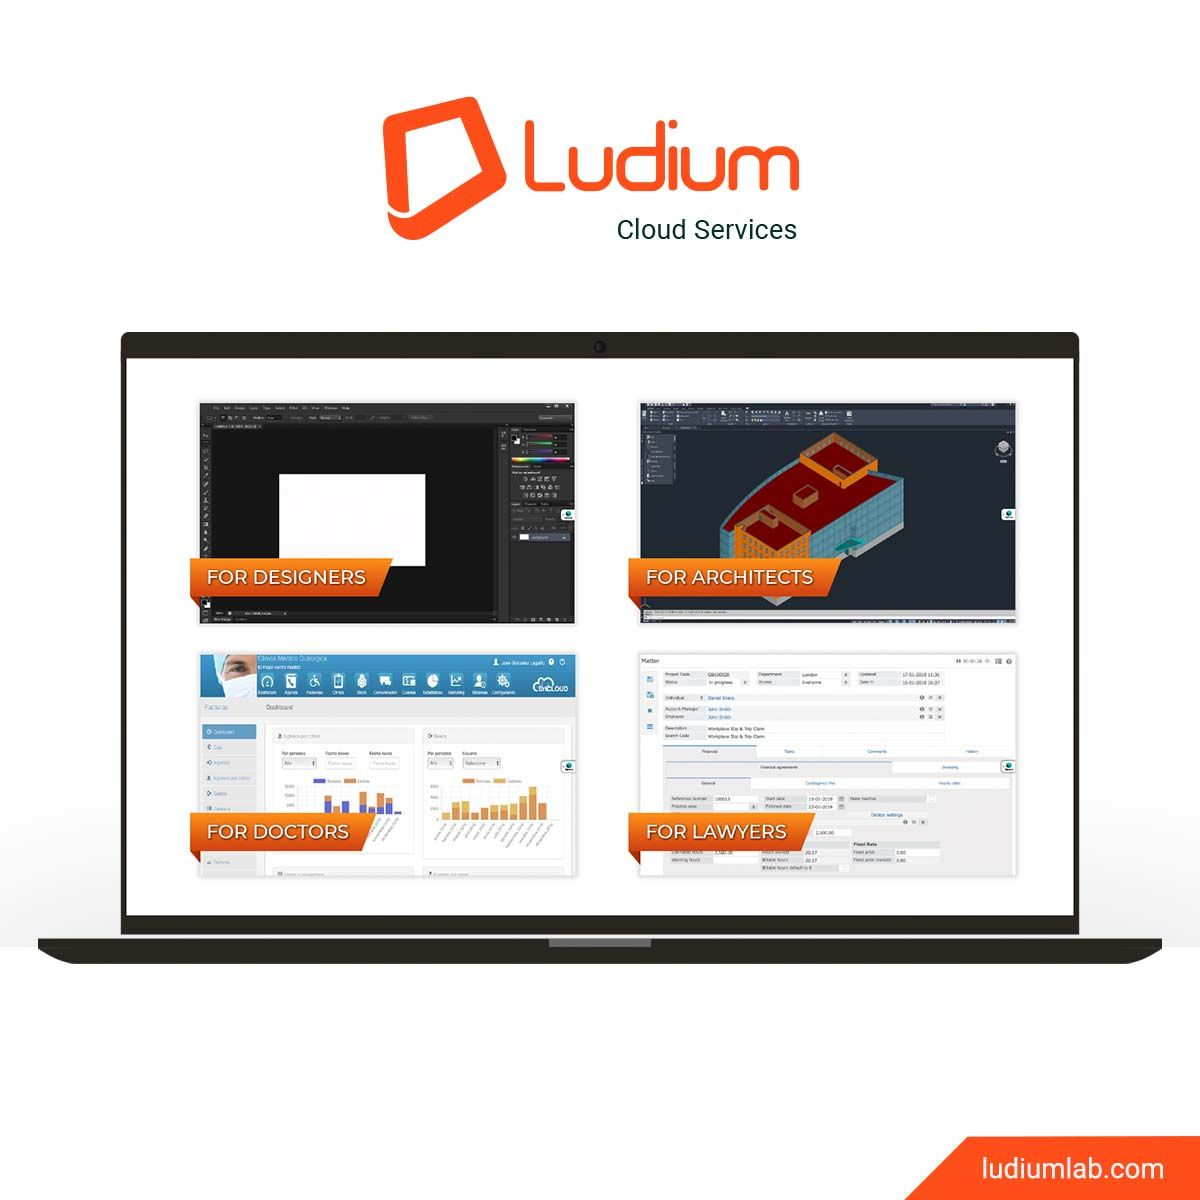 ludiumlab.com